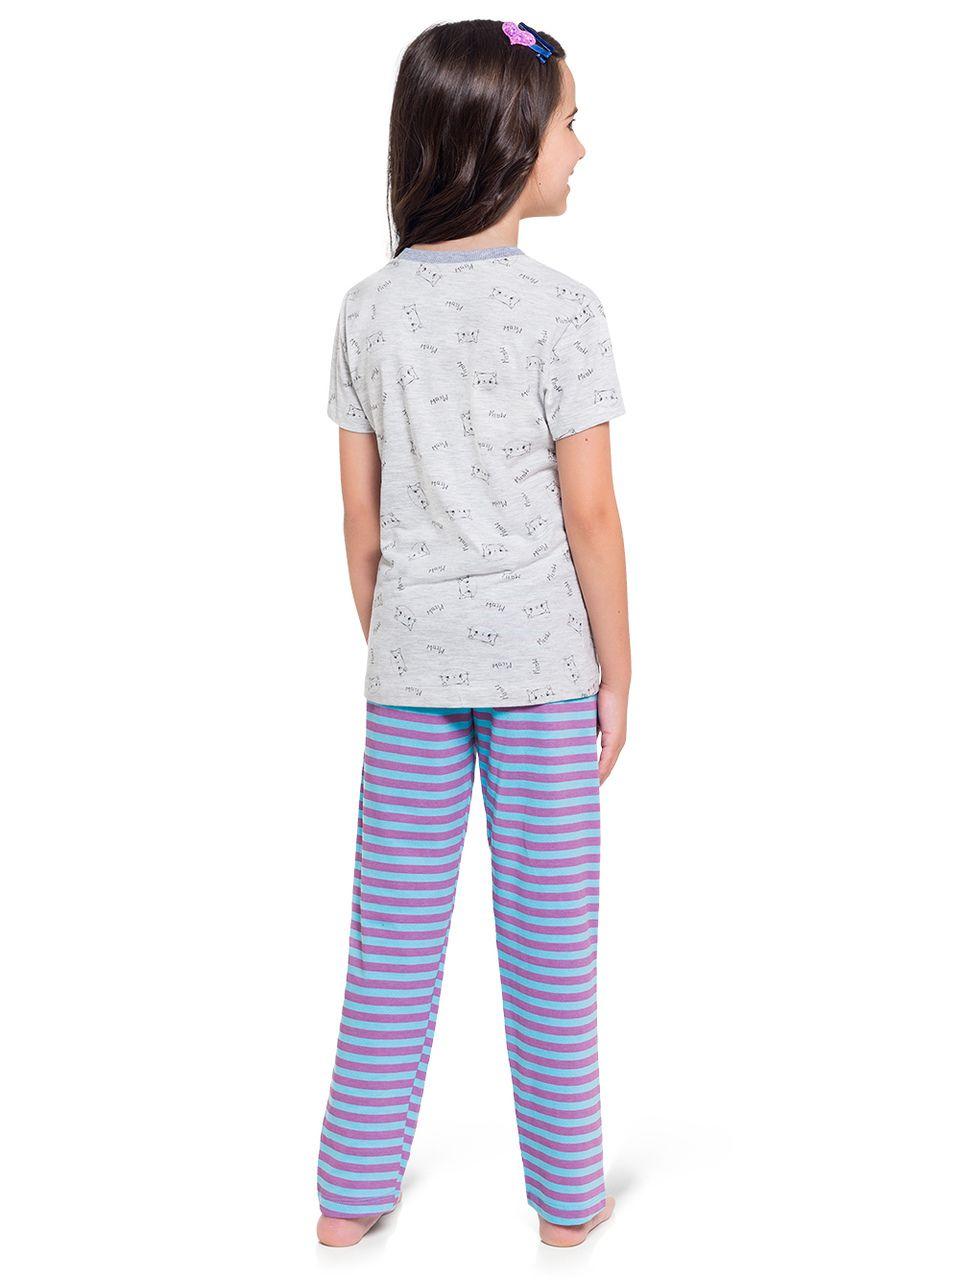 Pijama Infantil Menina 3 Peças Manga Longa Manga Curta Calça